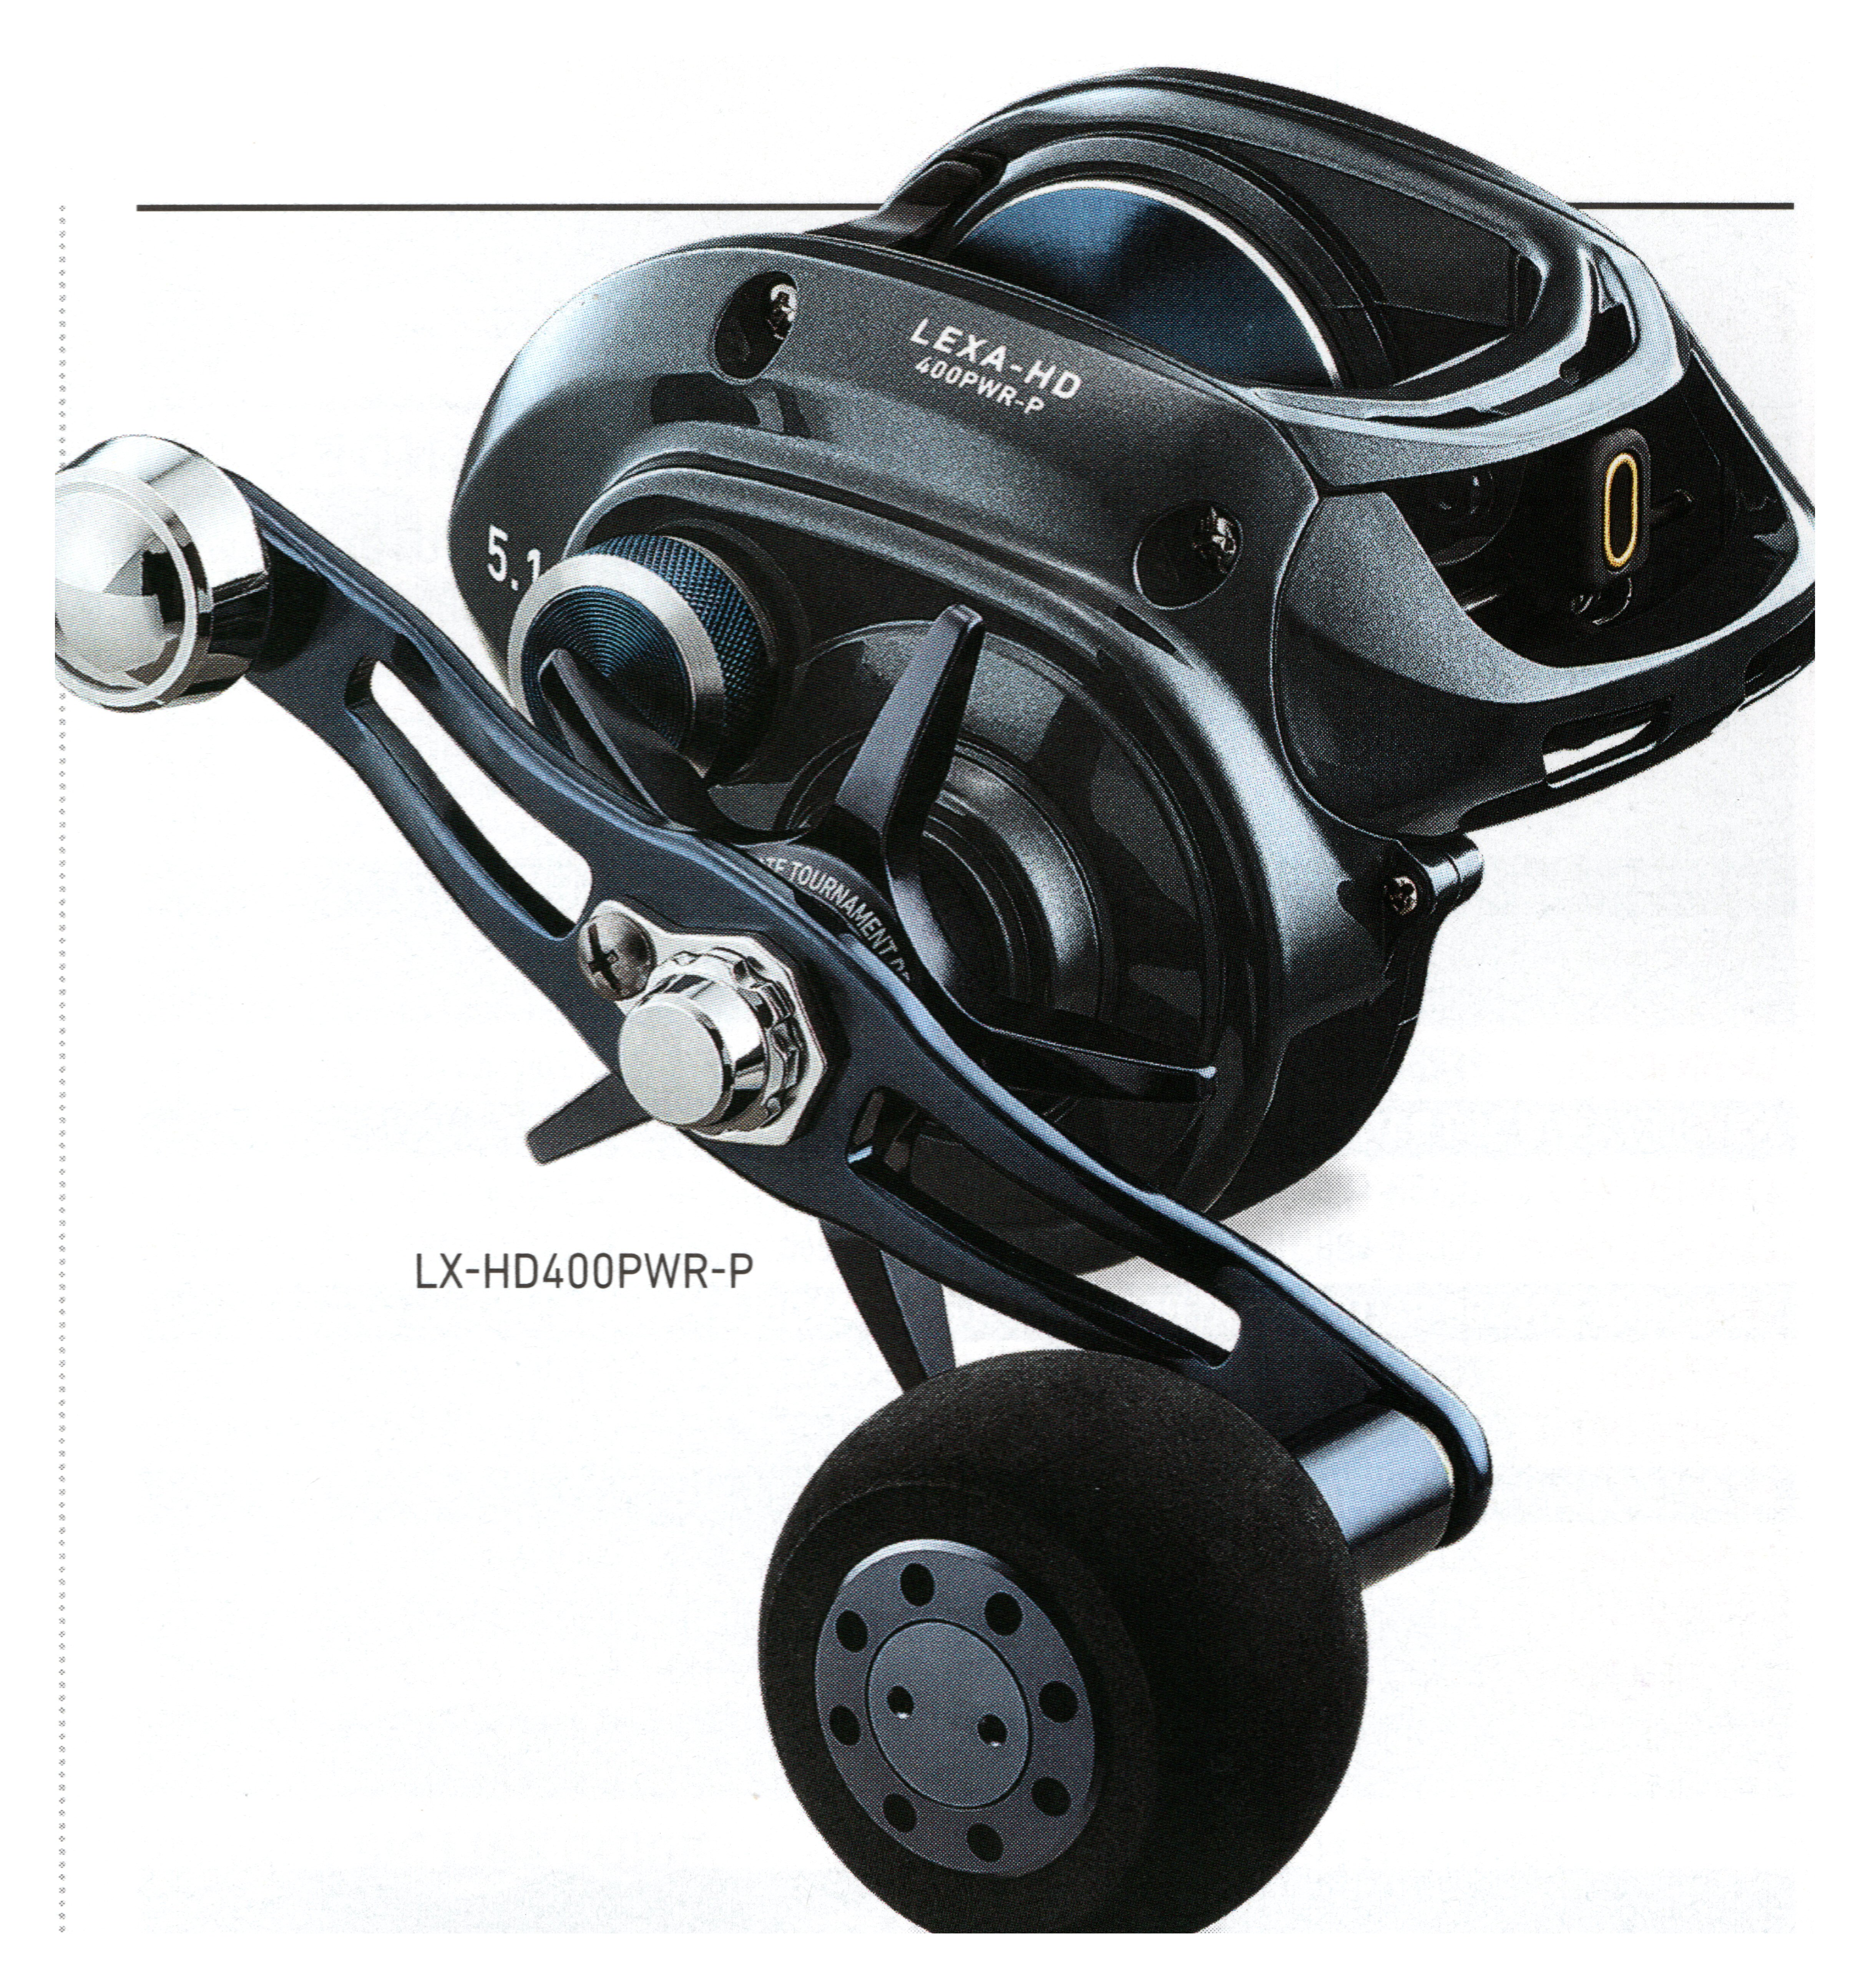 lexa-type-hd-400-power-handle11.jpg